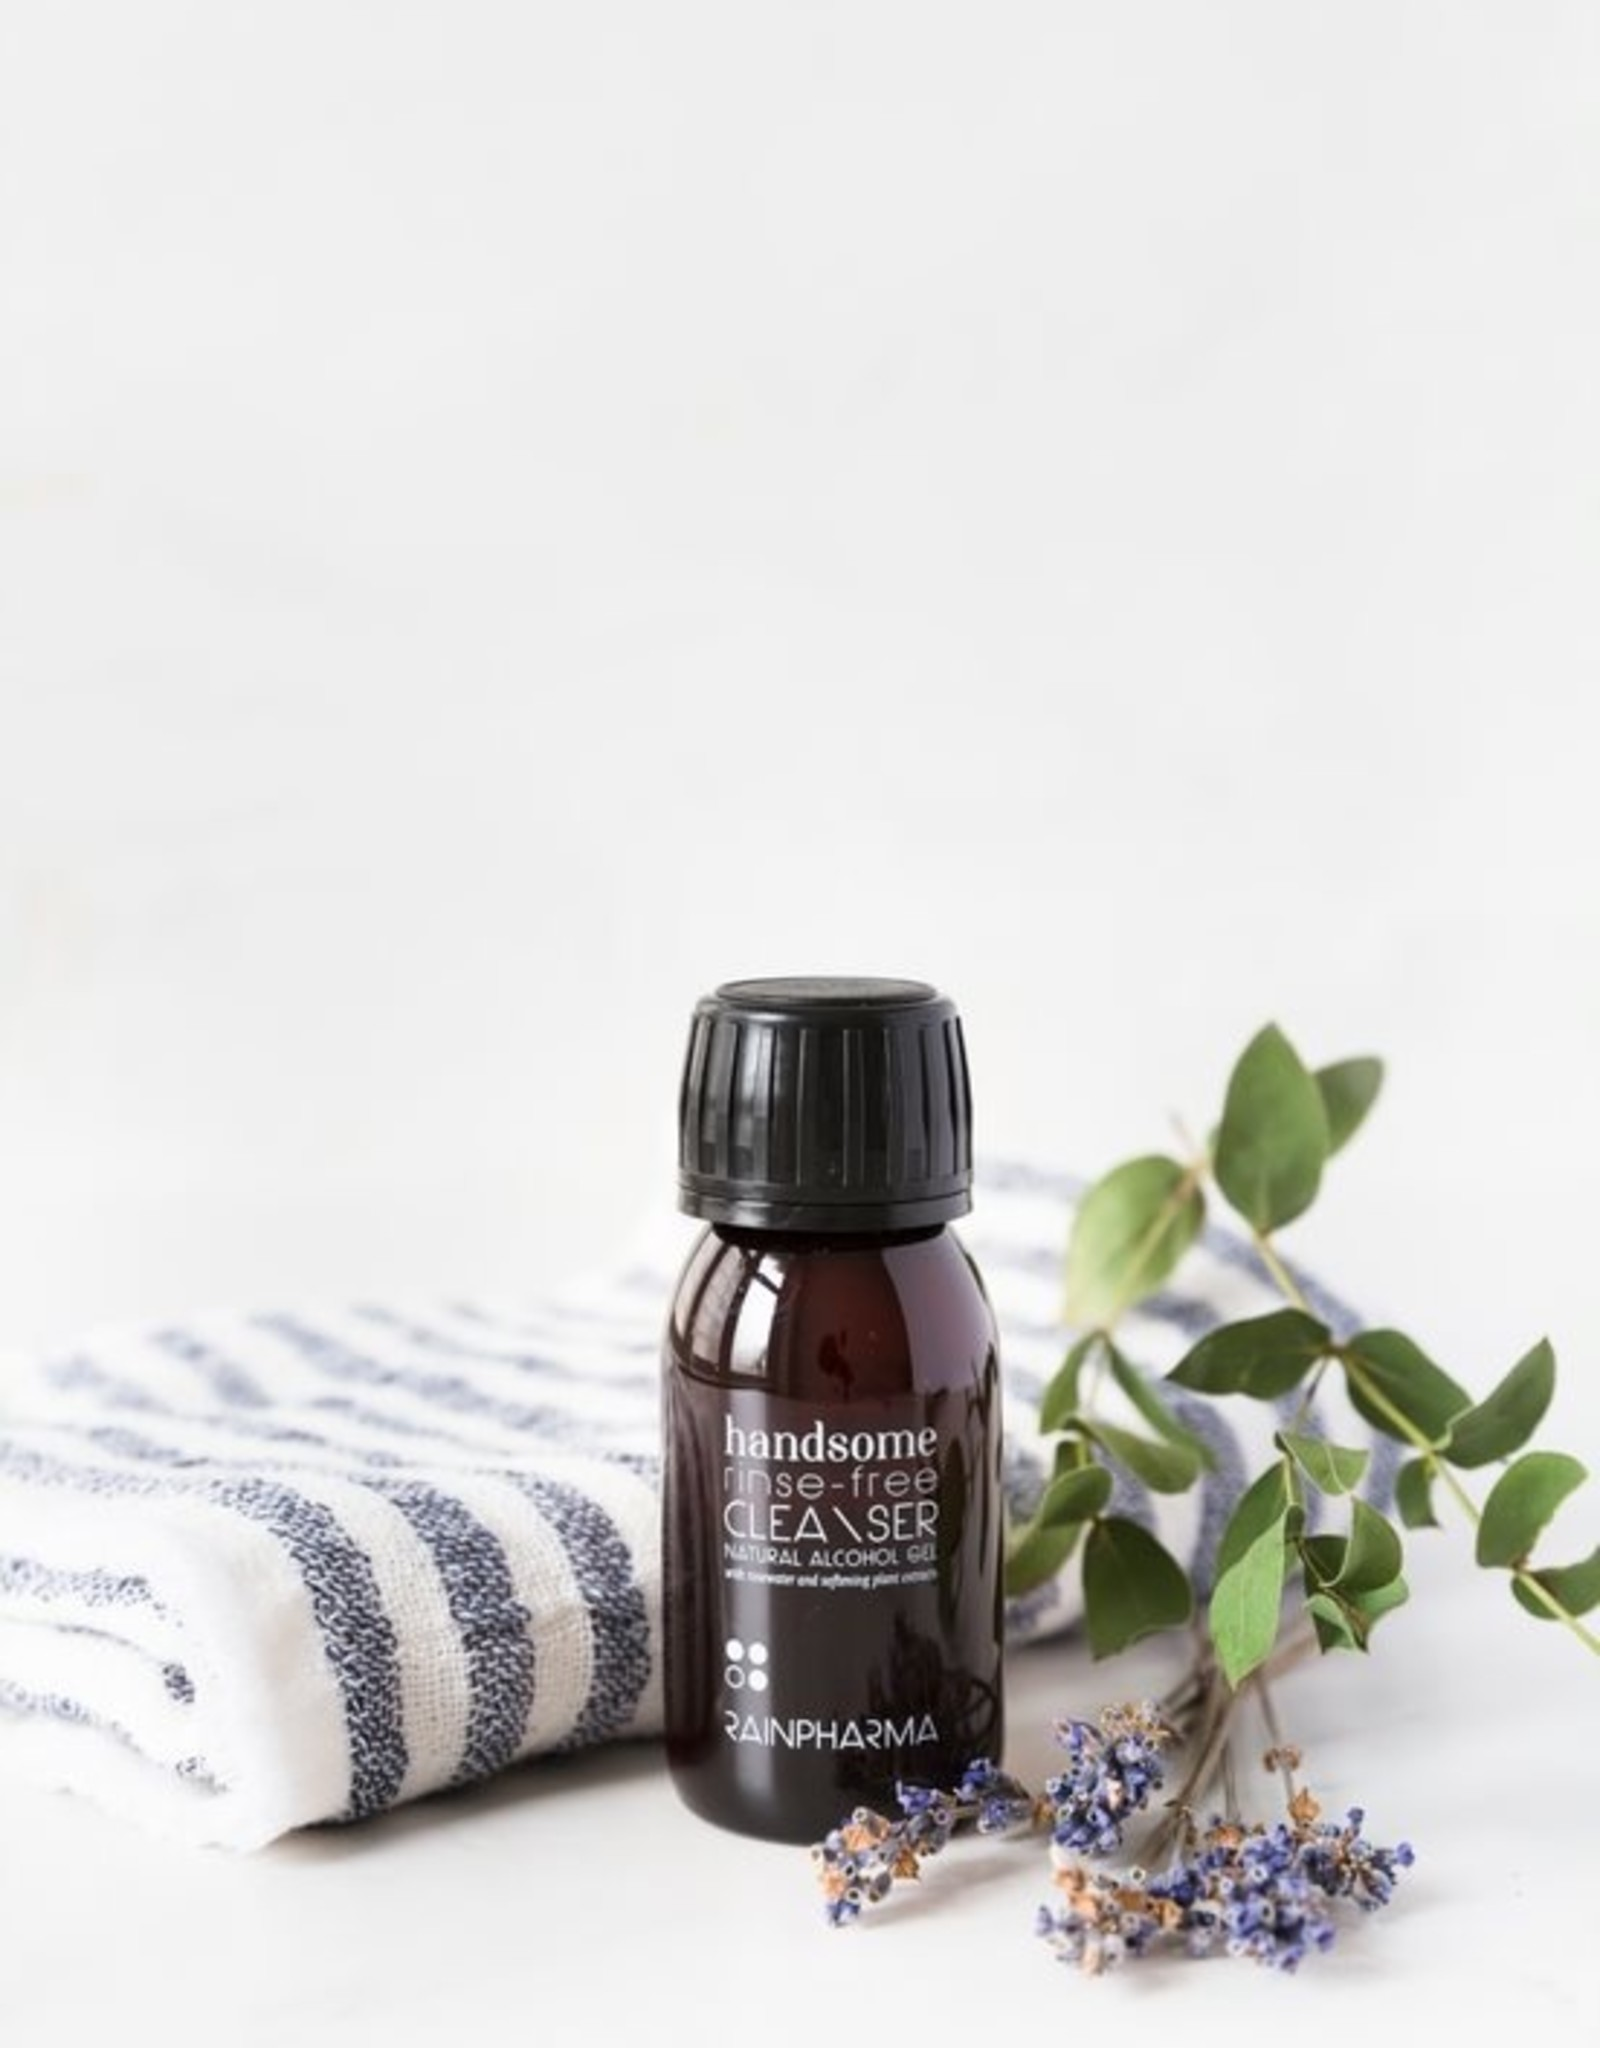 RainPharma TRAVEL - Handsome Rinse Free Cleanser 60ml - Rainpharma